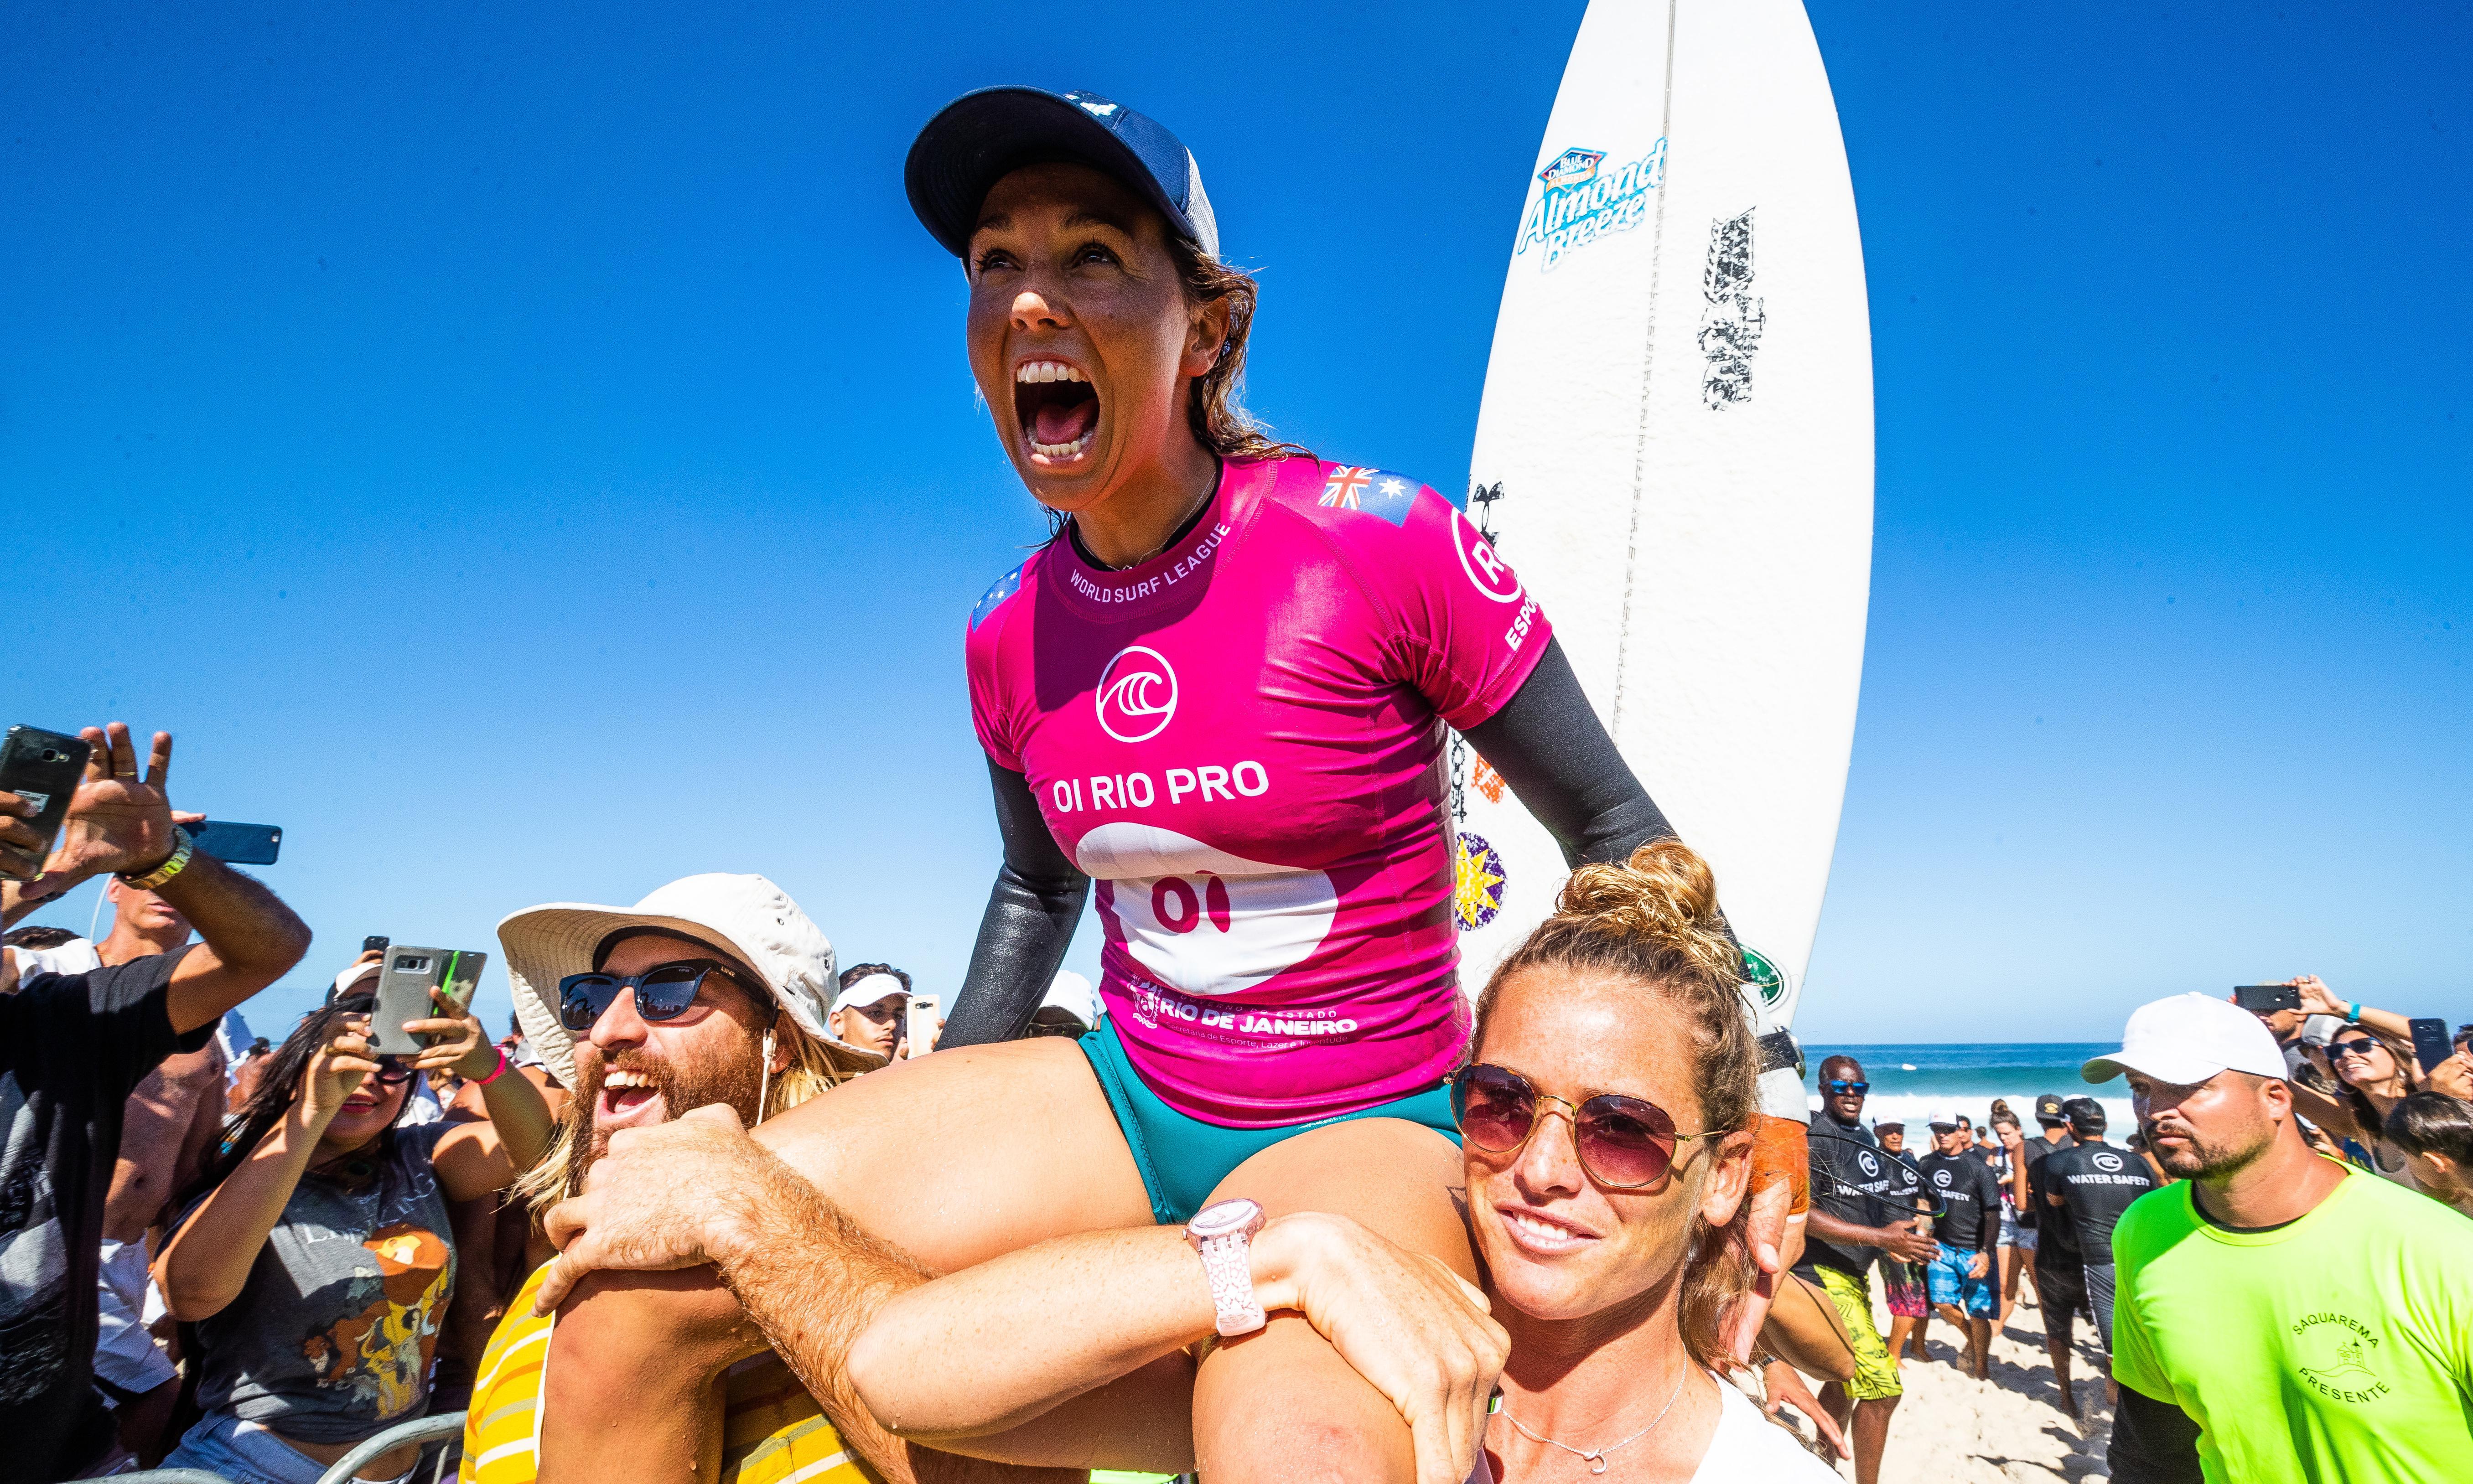 World-beating Australian sportswomen demonstrate refusal to play second fiddle